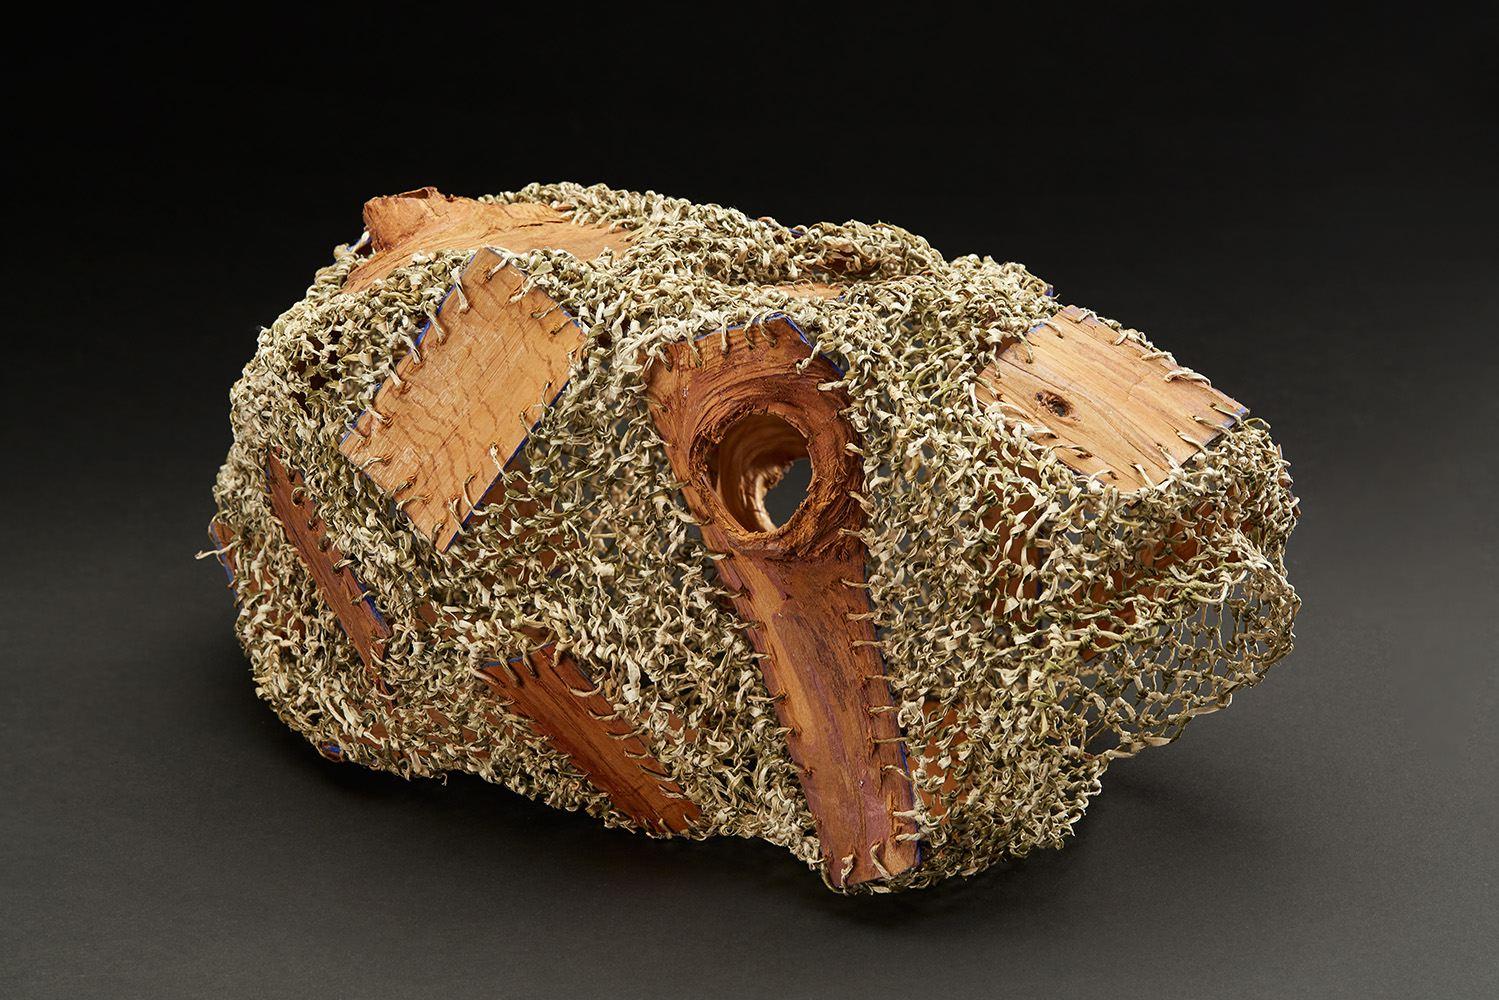 Hiroko Okuno  The Challenge of Materials   , 2018 Knotted kozo and hinoki (Japanese cypress) 6.5 x 6 x 12 inches 16.5 x 15.2 x 30.5 cm HOk 4